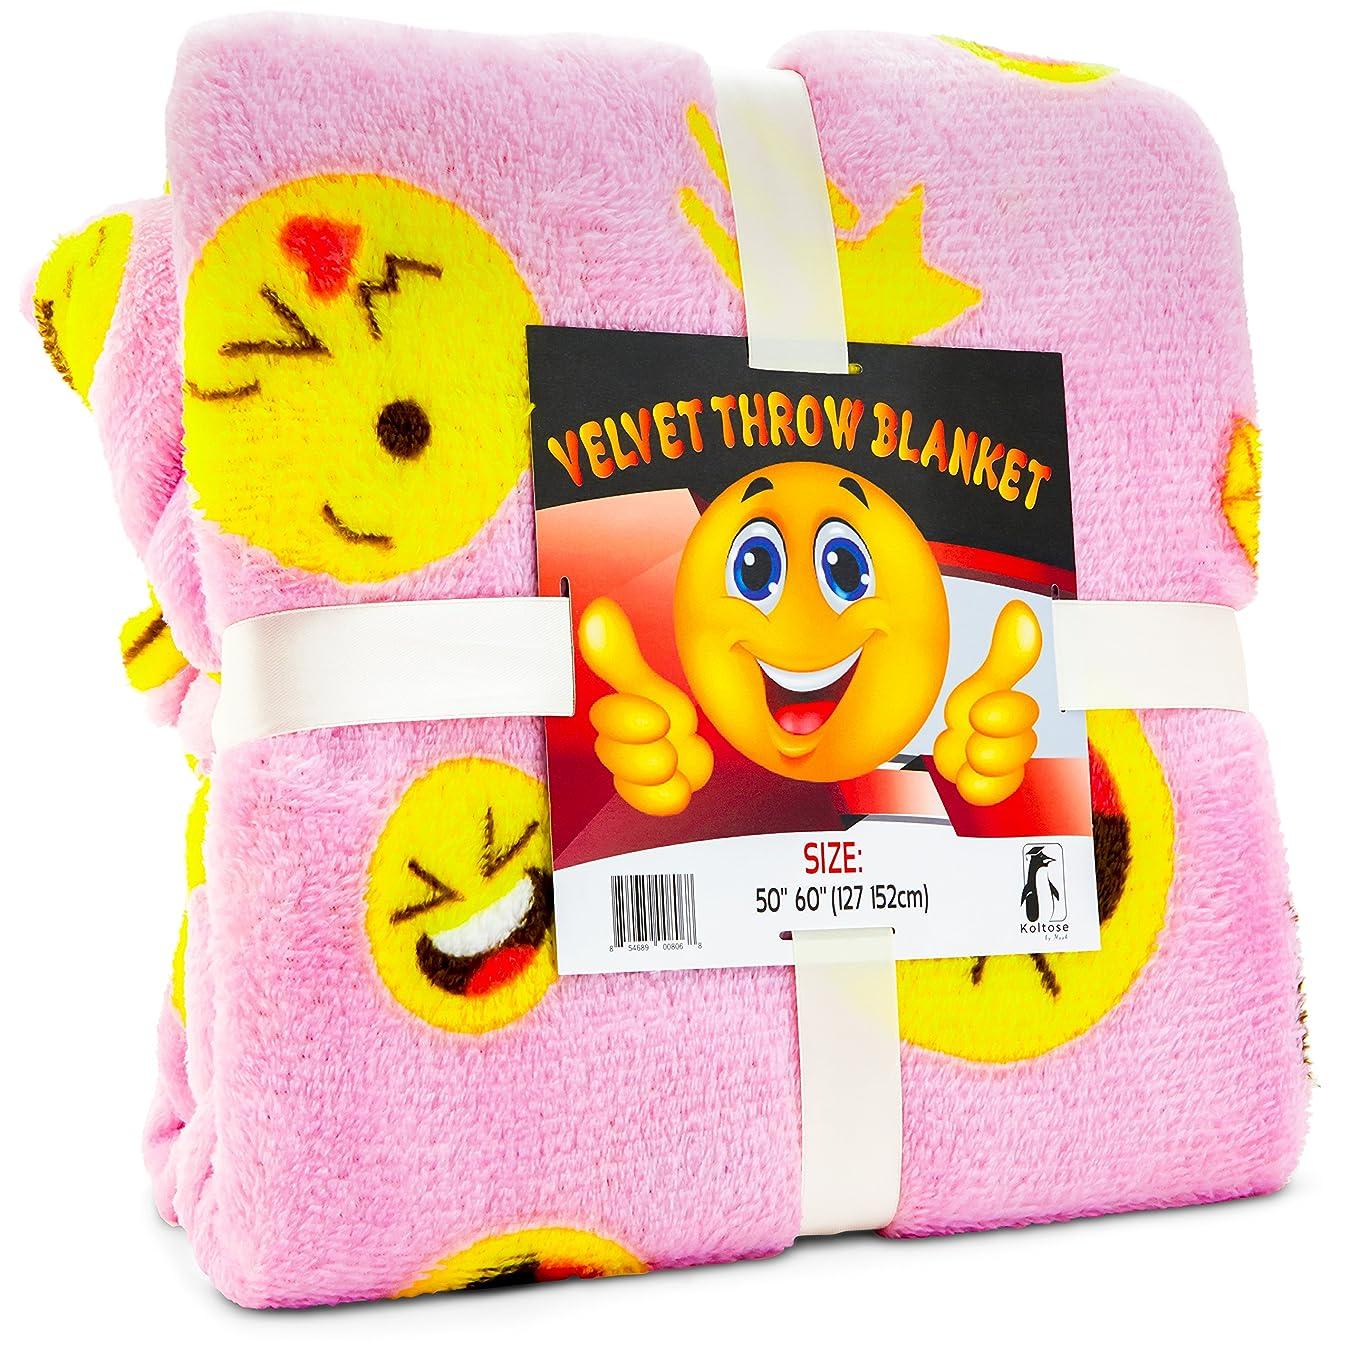 c4b66580 ... Koltose by Mash Pink Emoji Throw Blanket, Adorable Soft Large Fluffy  Lightweight Emoticon Blanket for